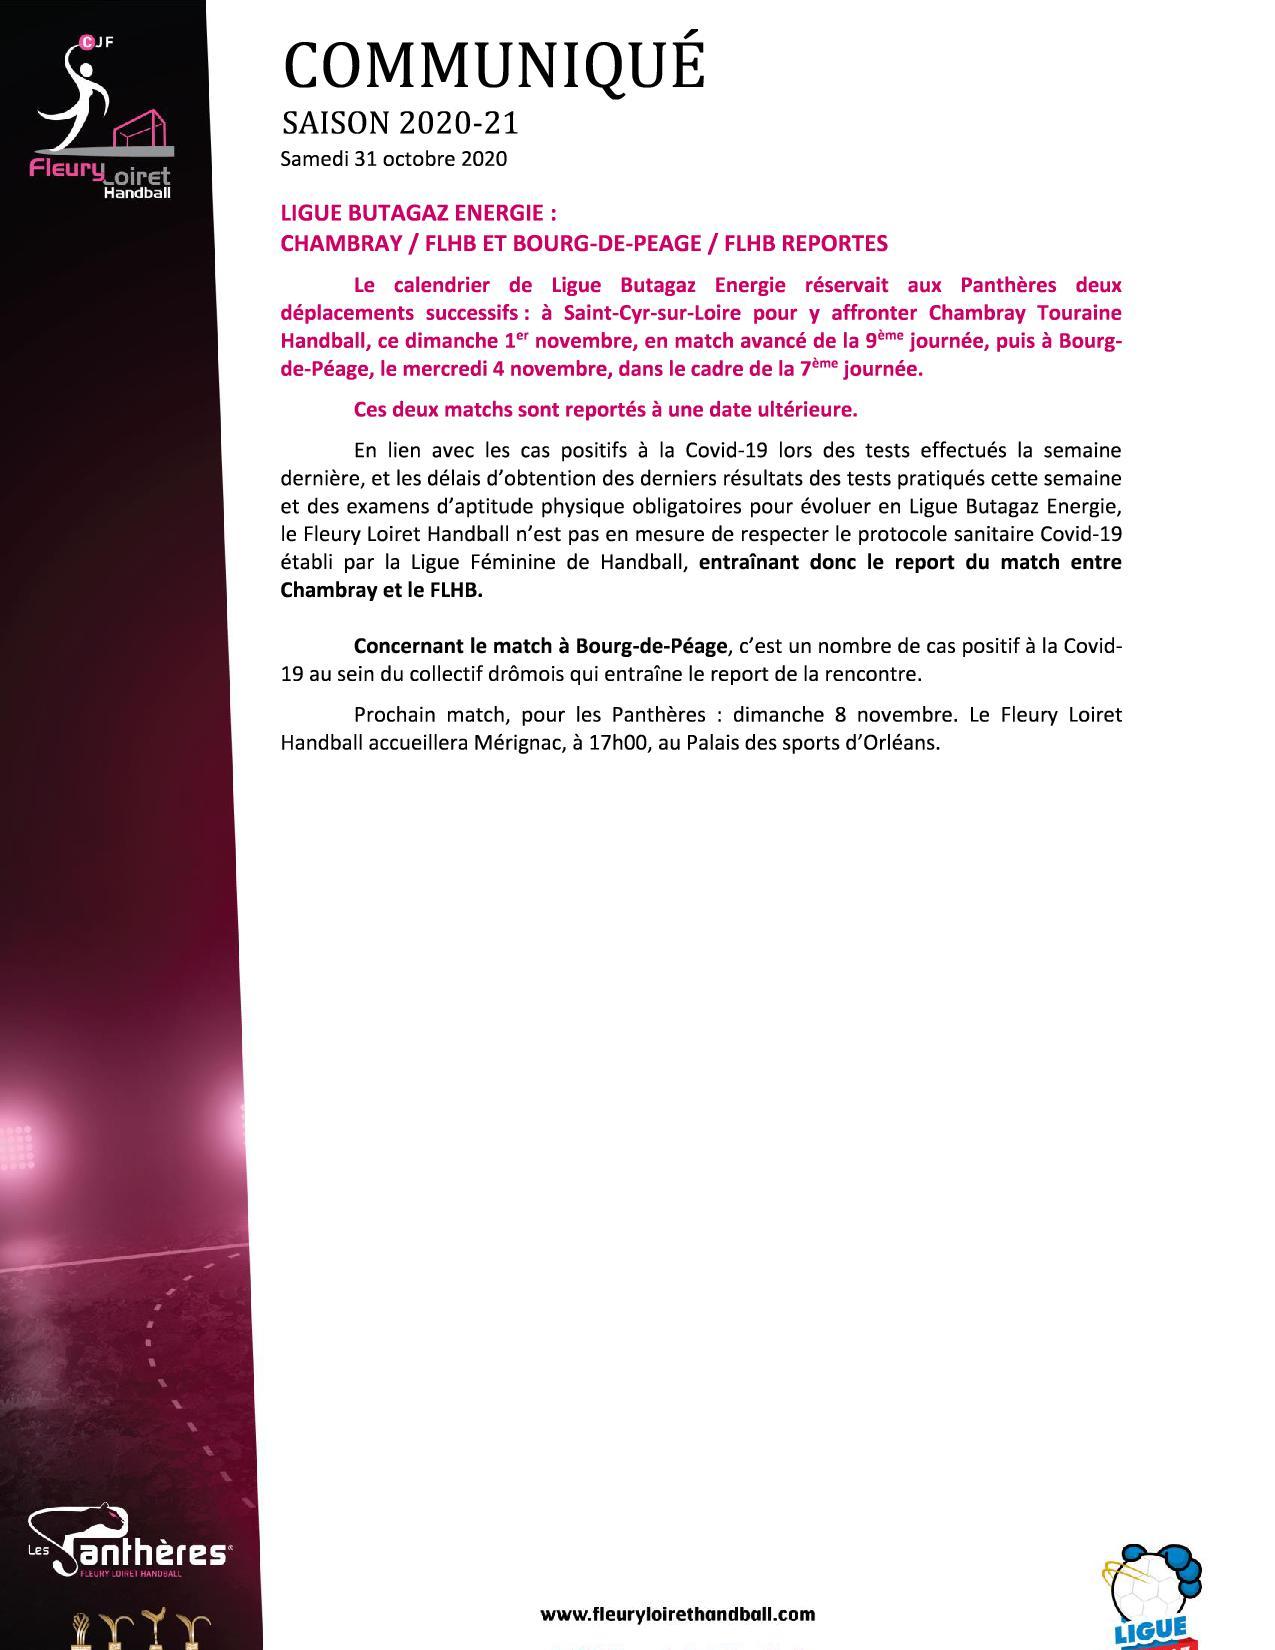 Communiqué Fleury Loiret Handball - Samedi 31 octobre 2020.jpg